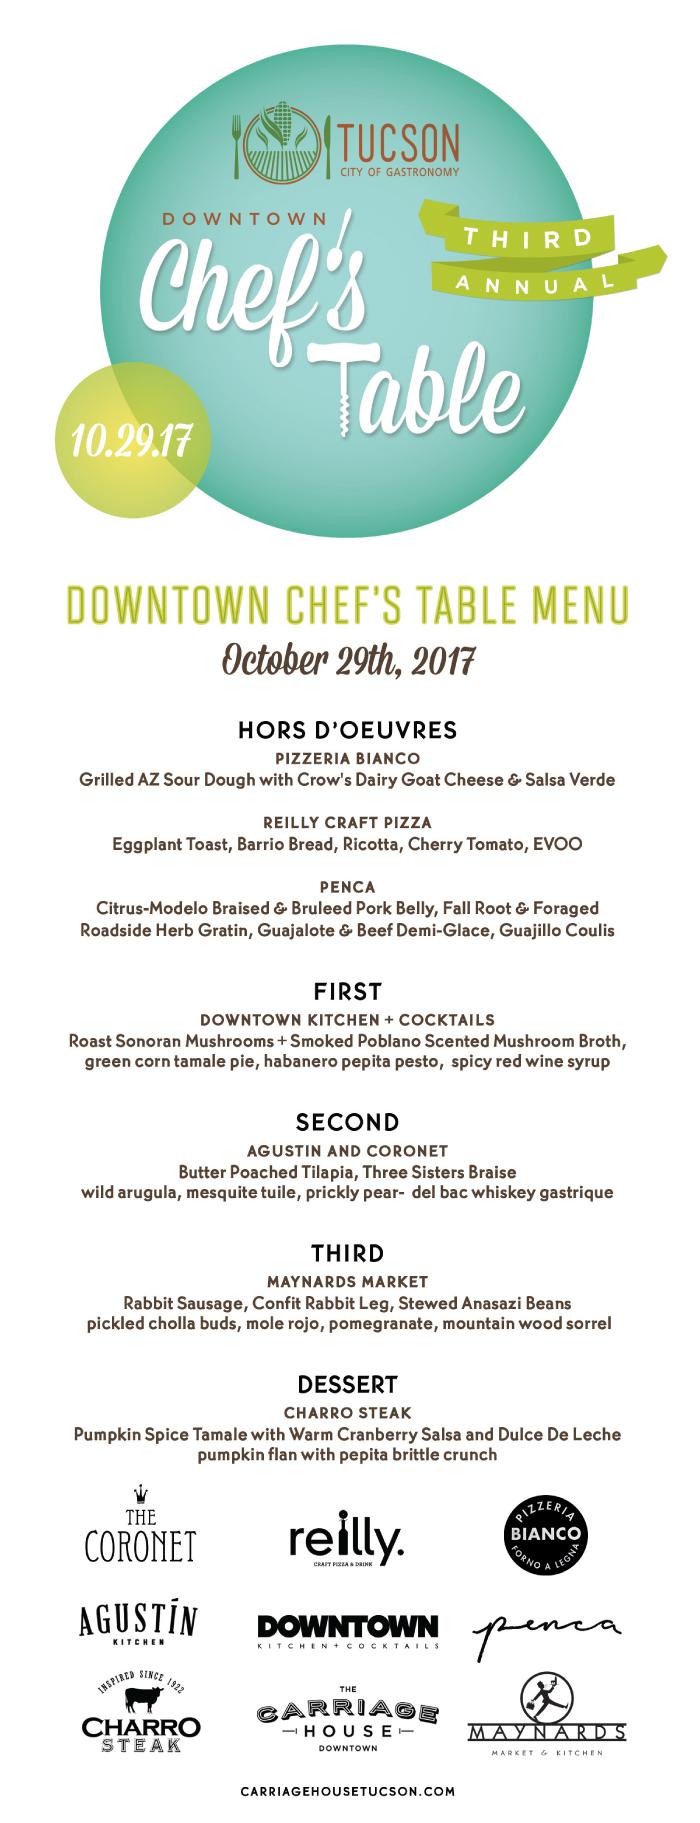 DT-ChefsTable-Menu2017onWhite2.eps